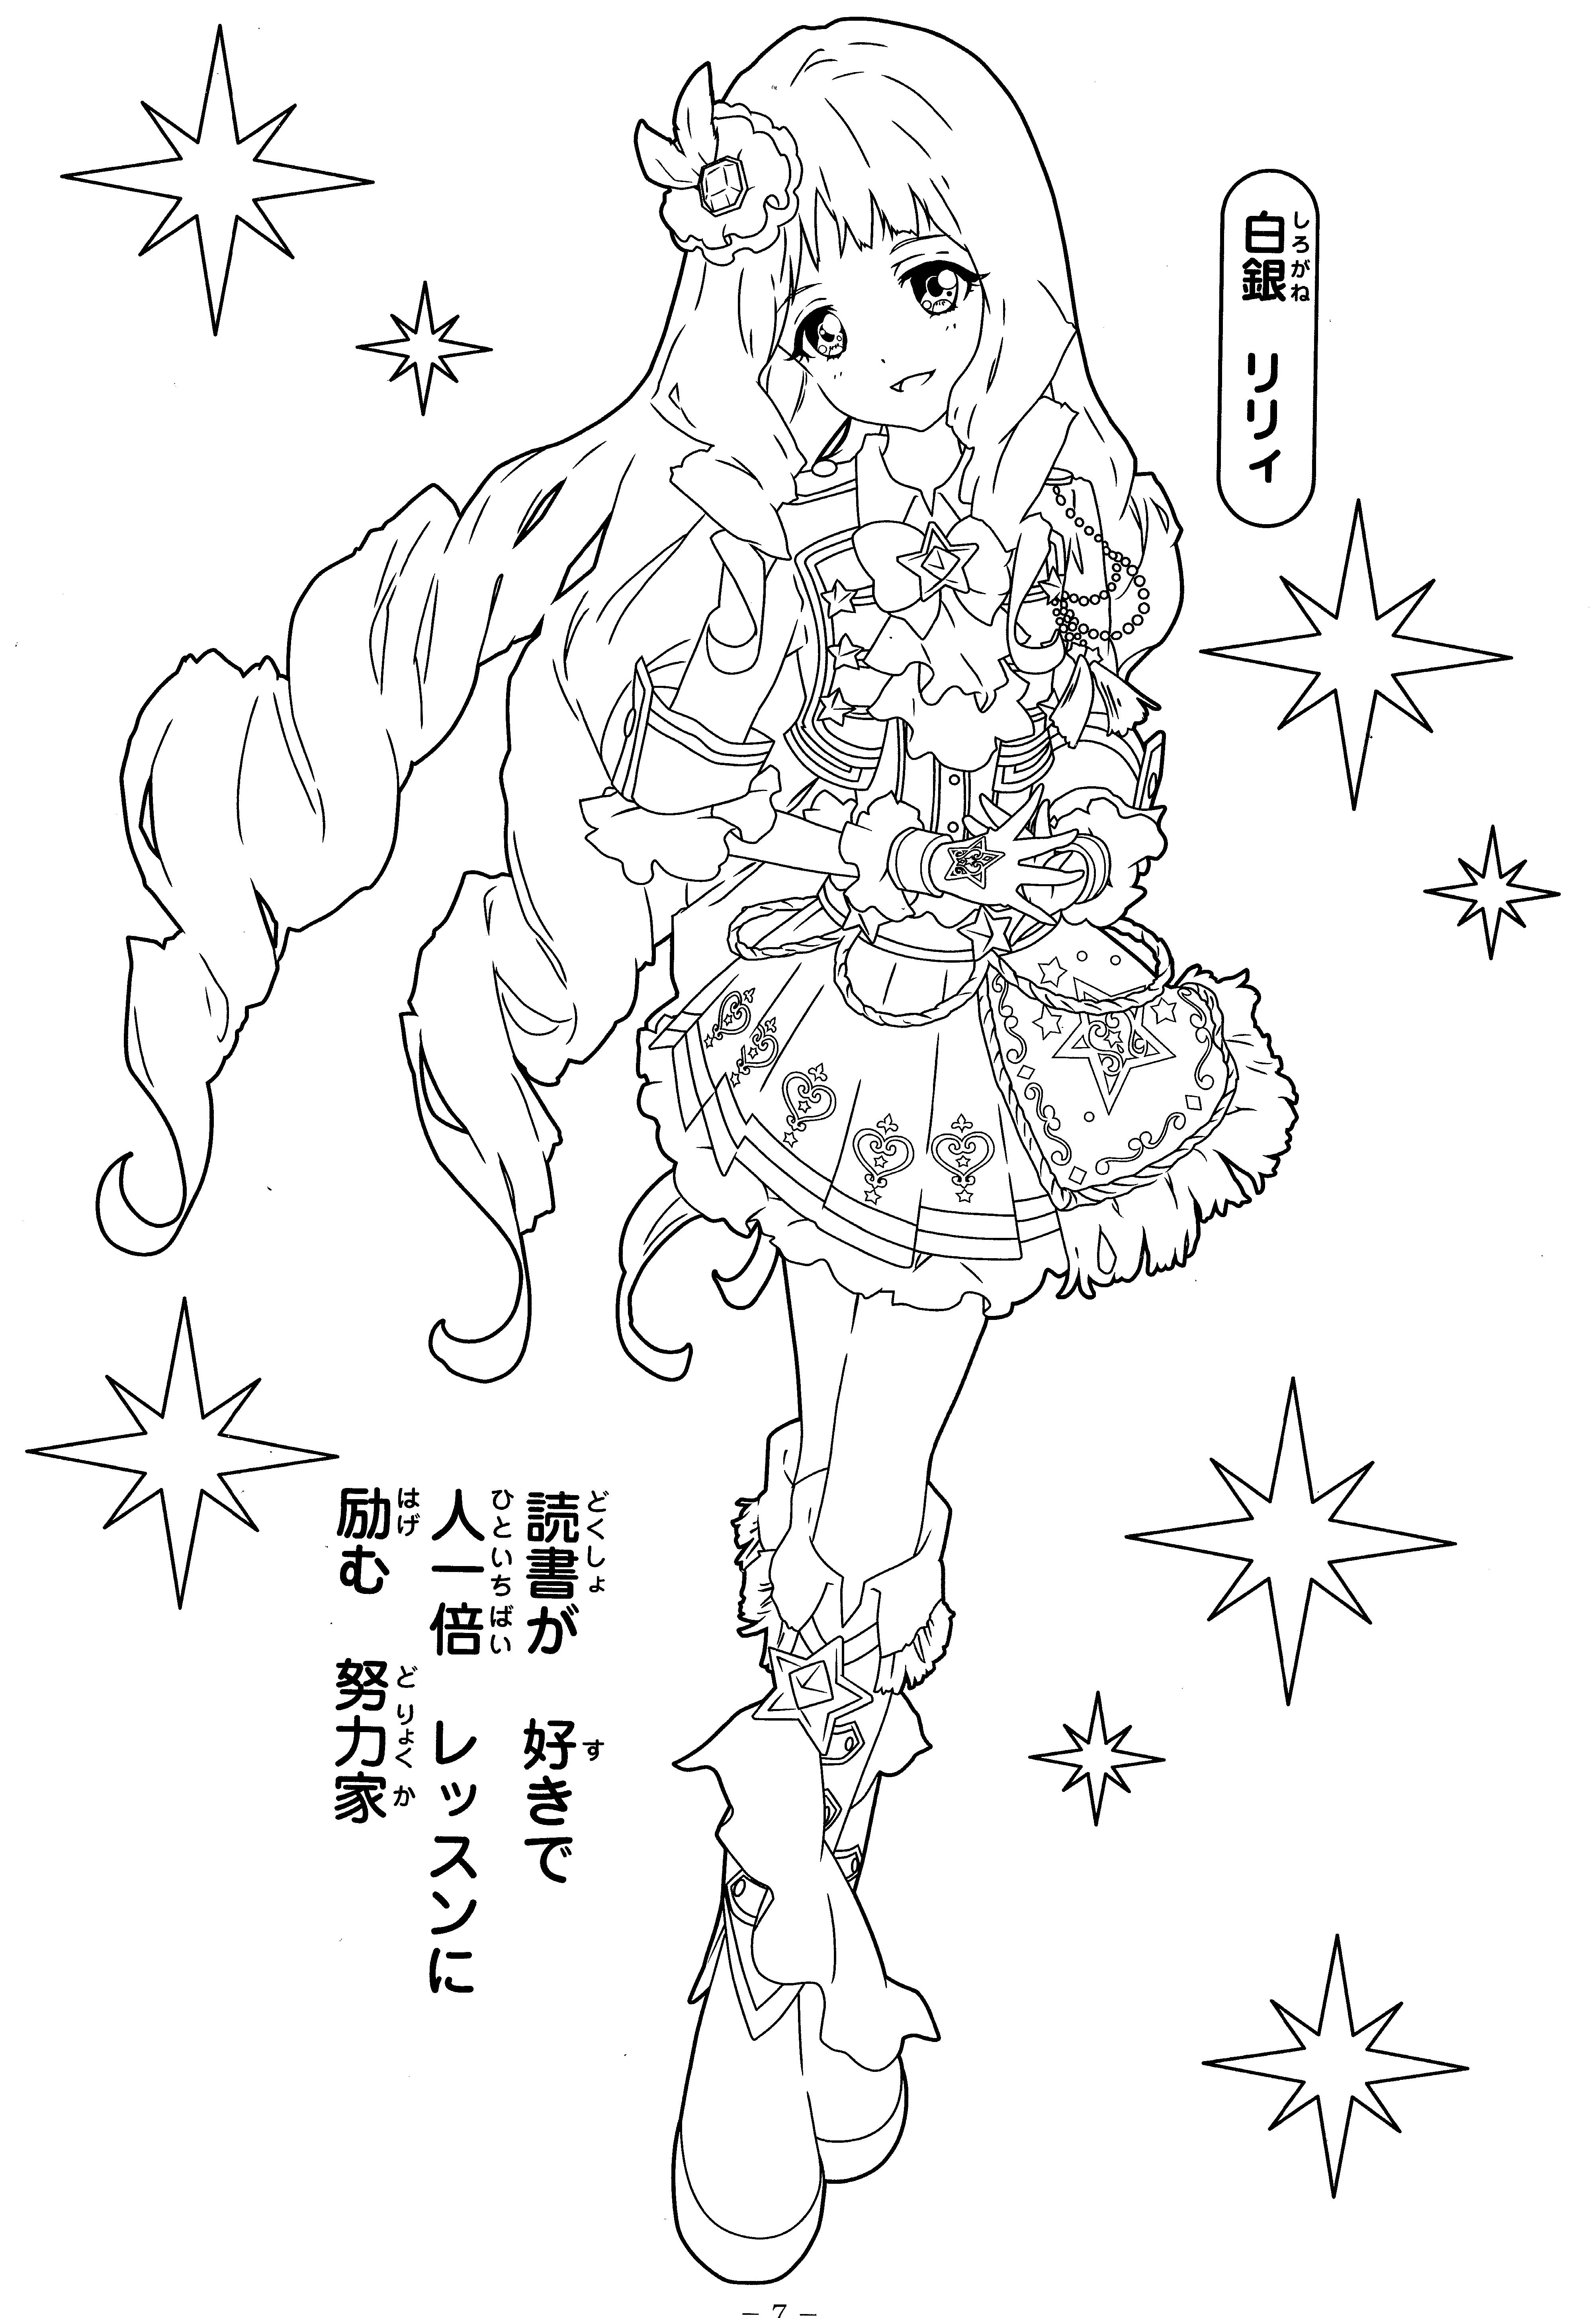 New Aikatsu Stars Scans by PrincessAmisi